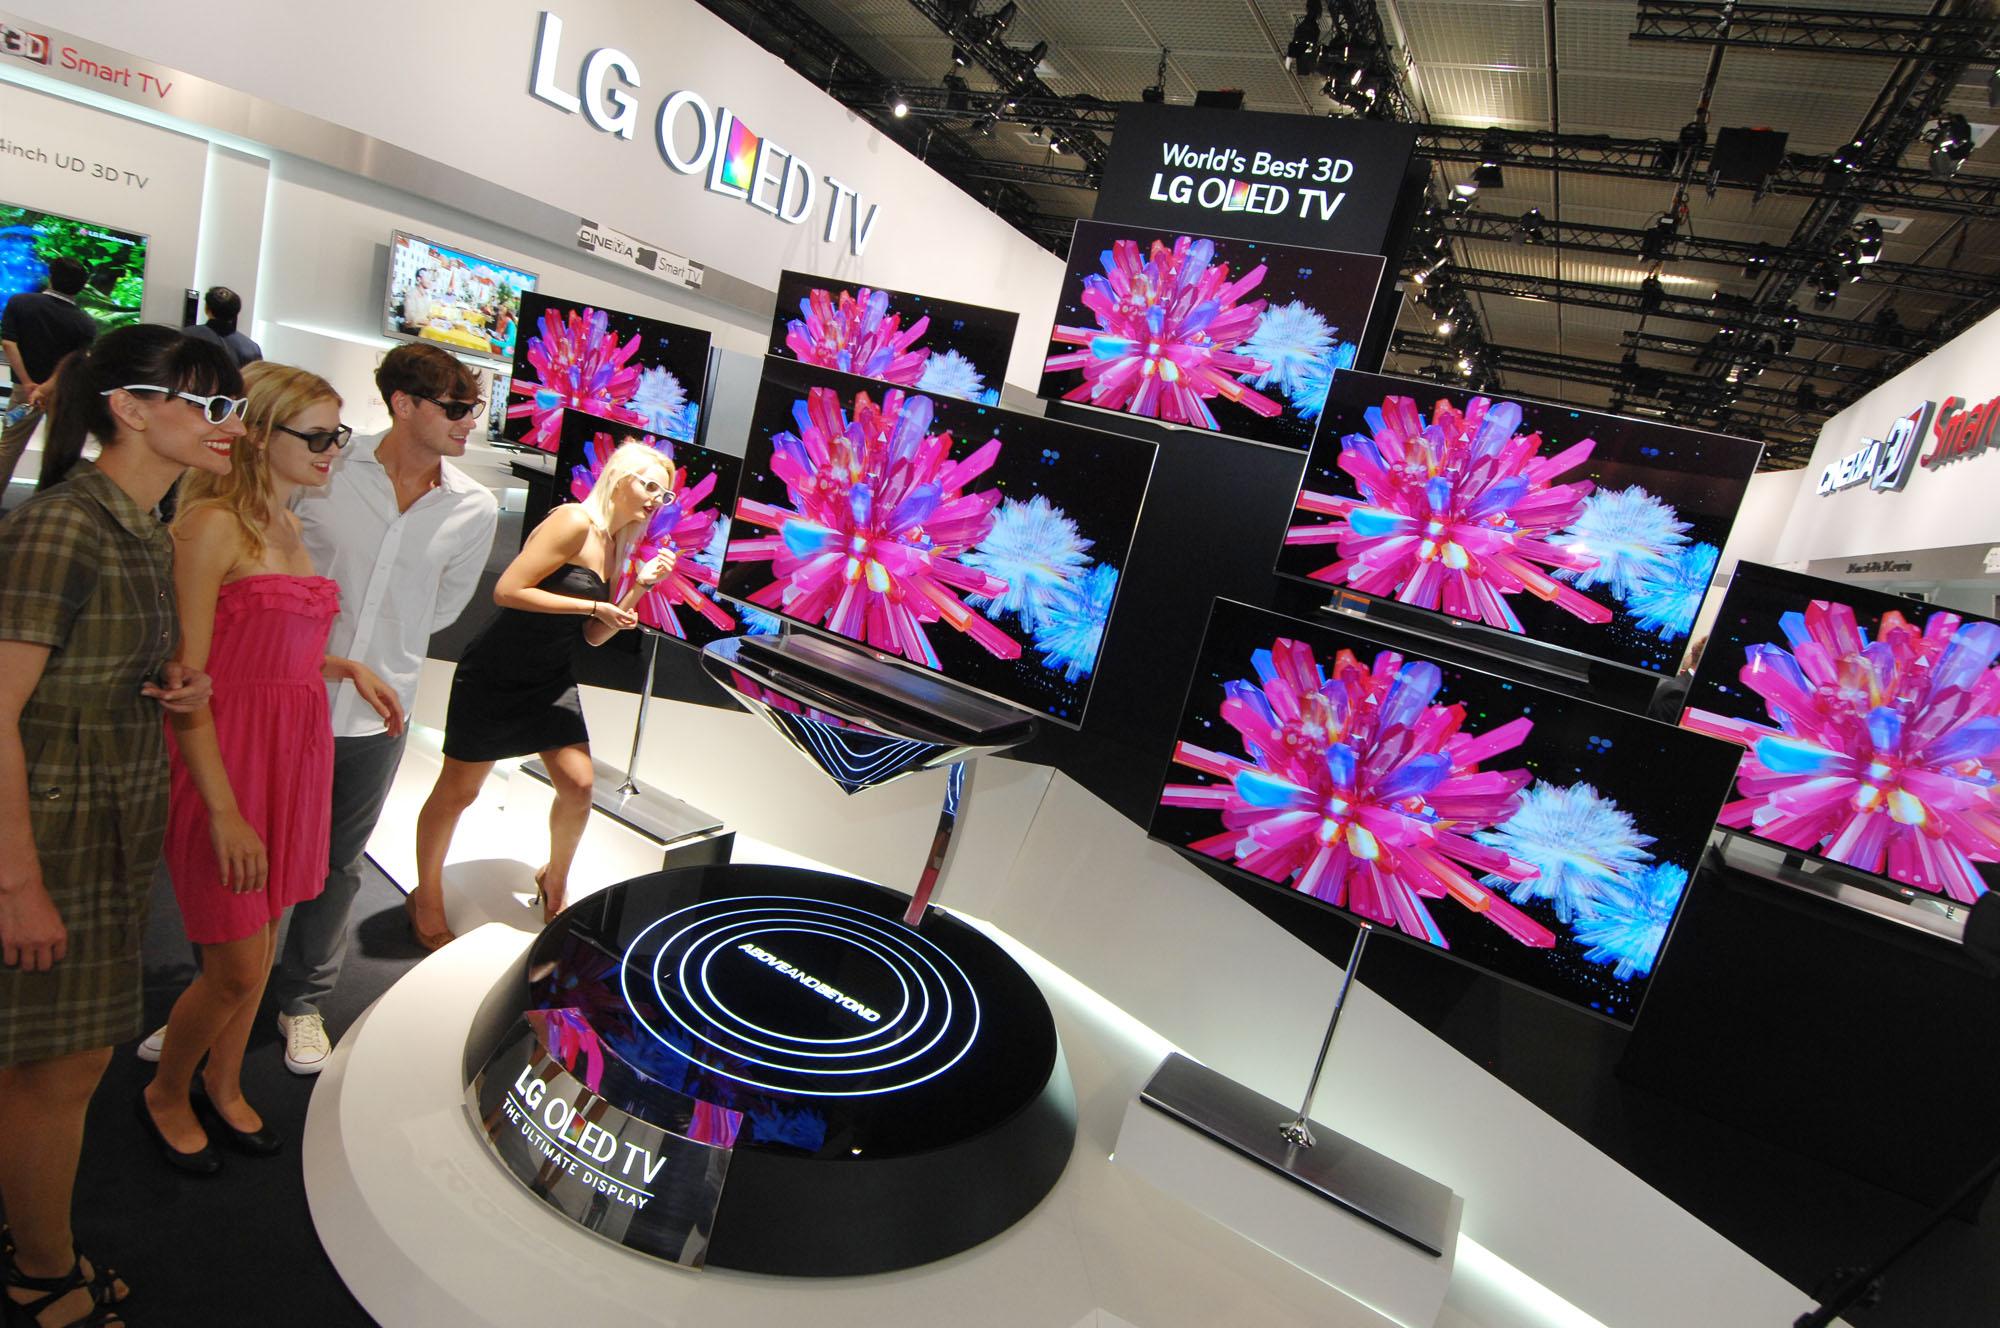 LG OLED TV at IFA 2012 (1)